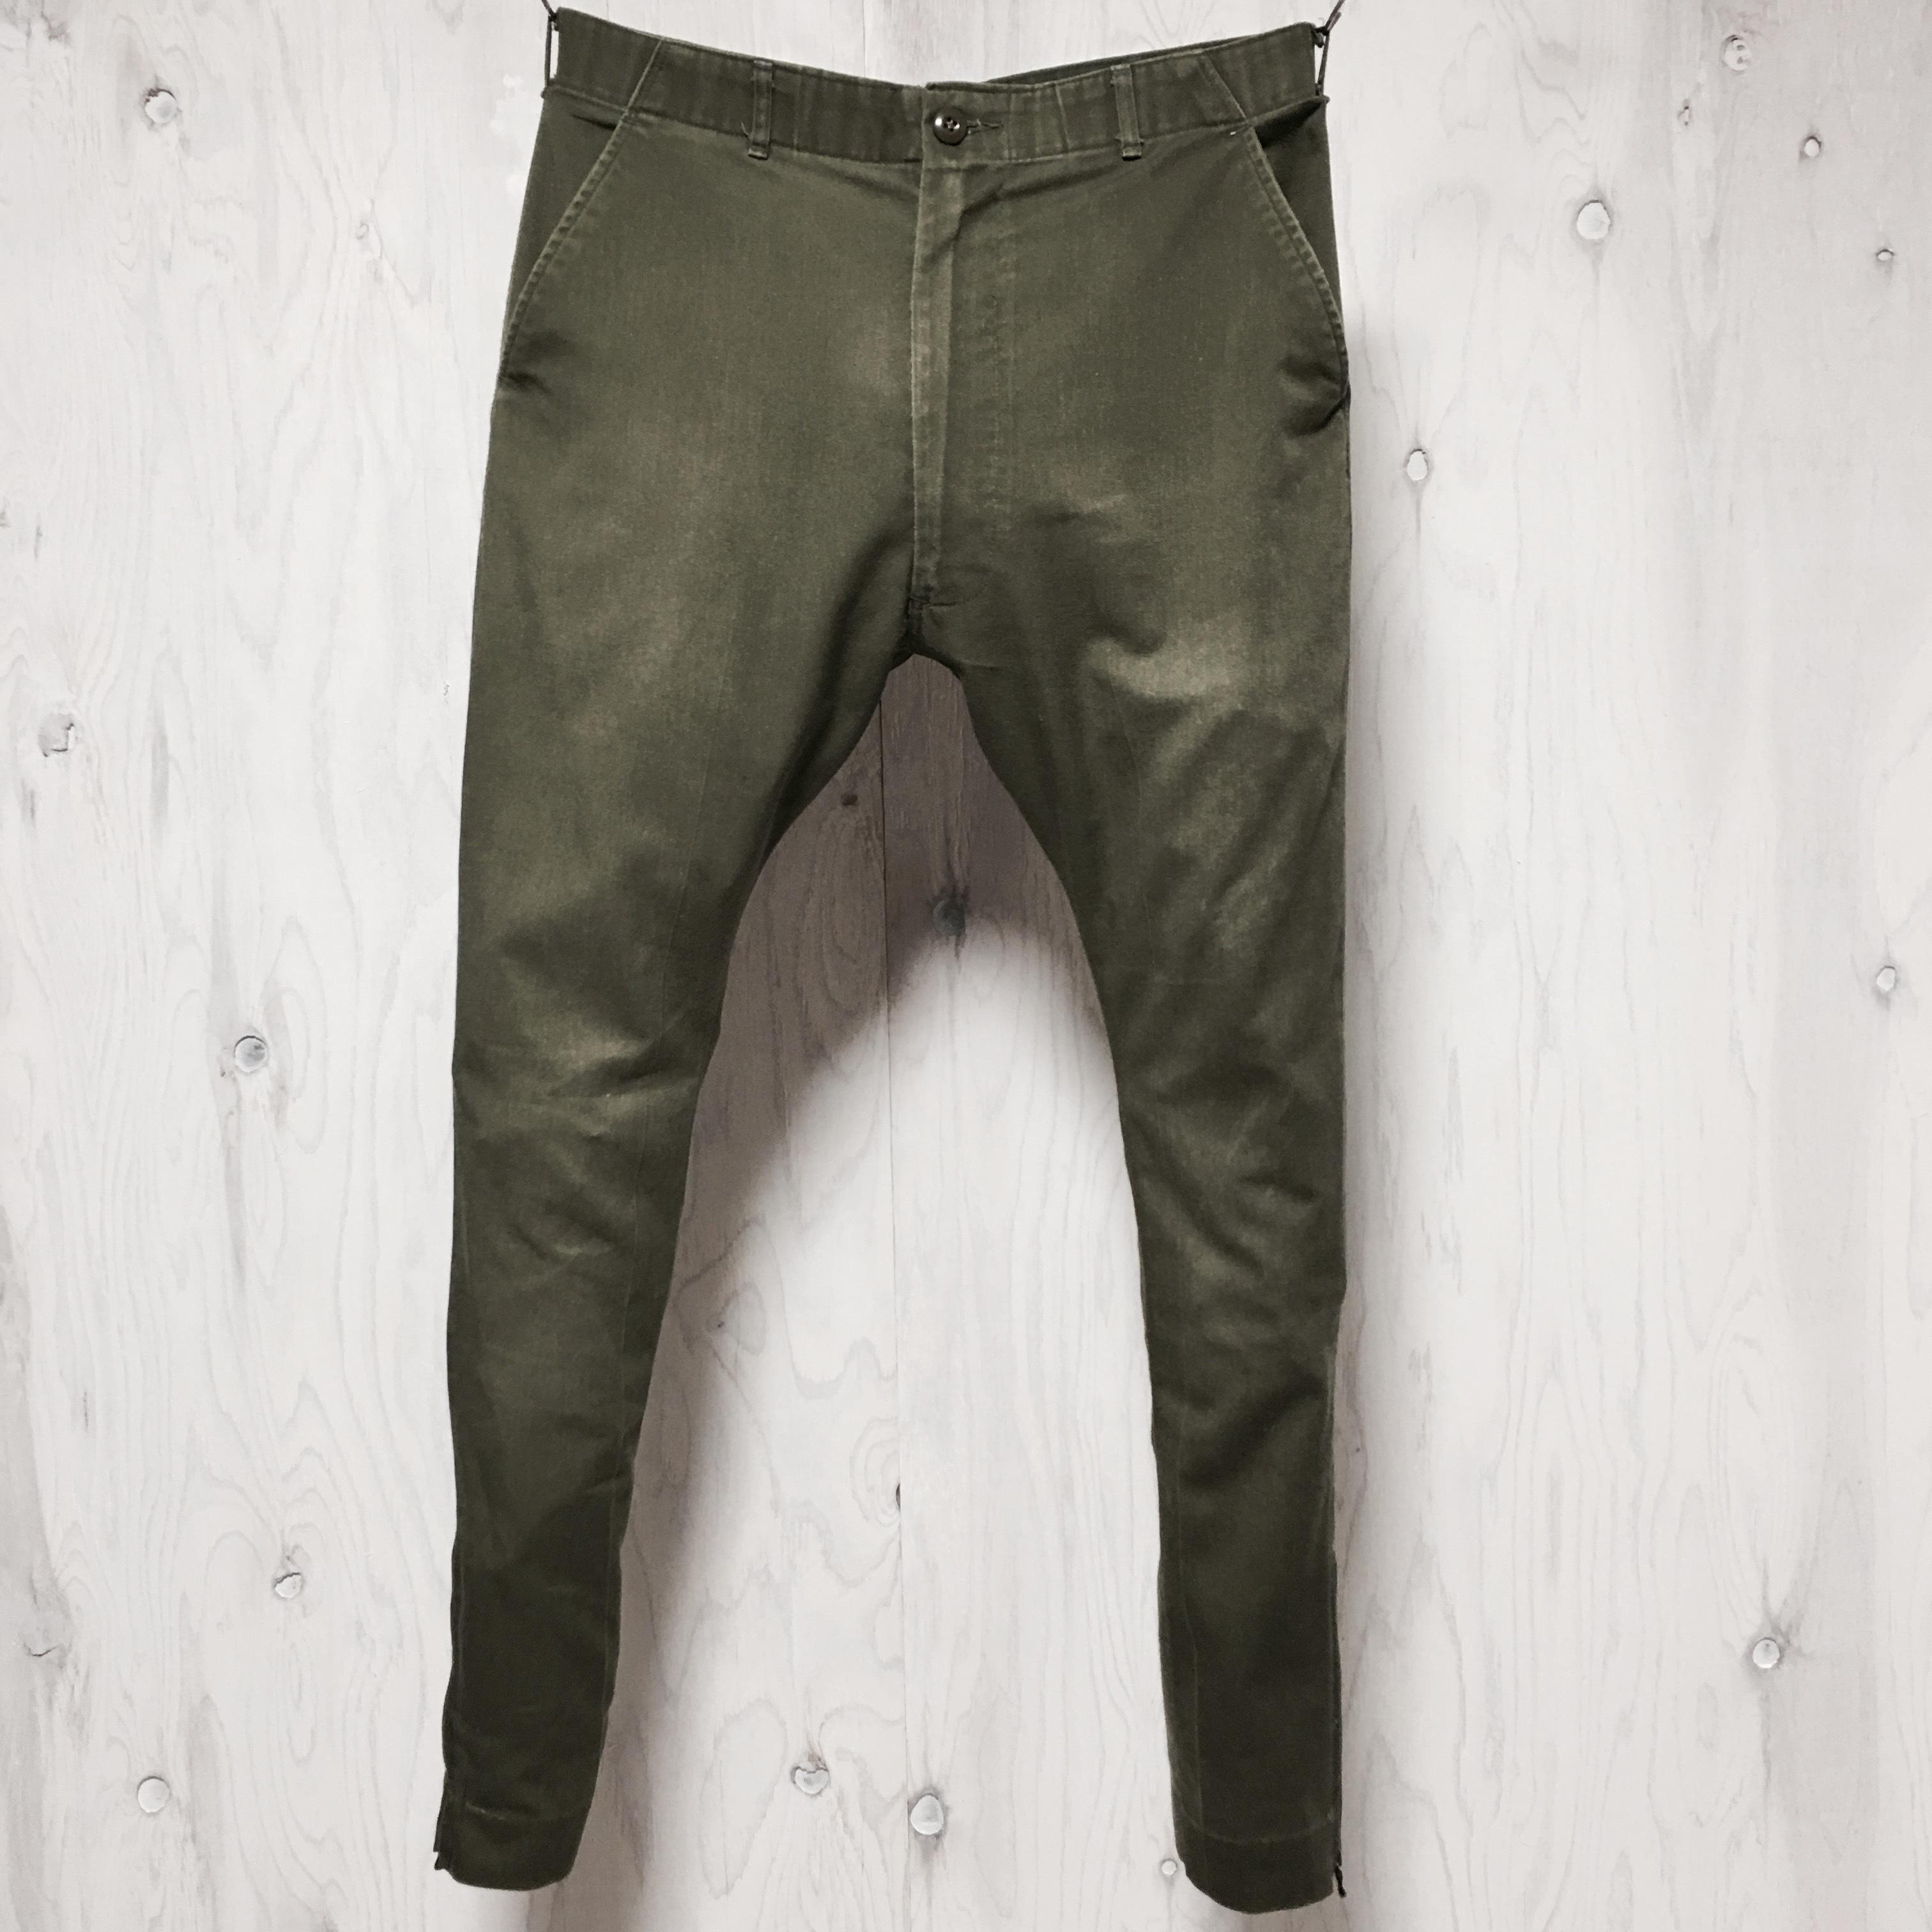 Utility pants tapered silhouette riri zip custom w33